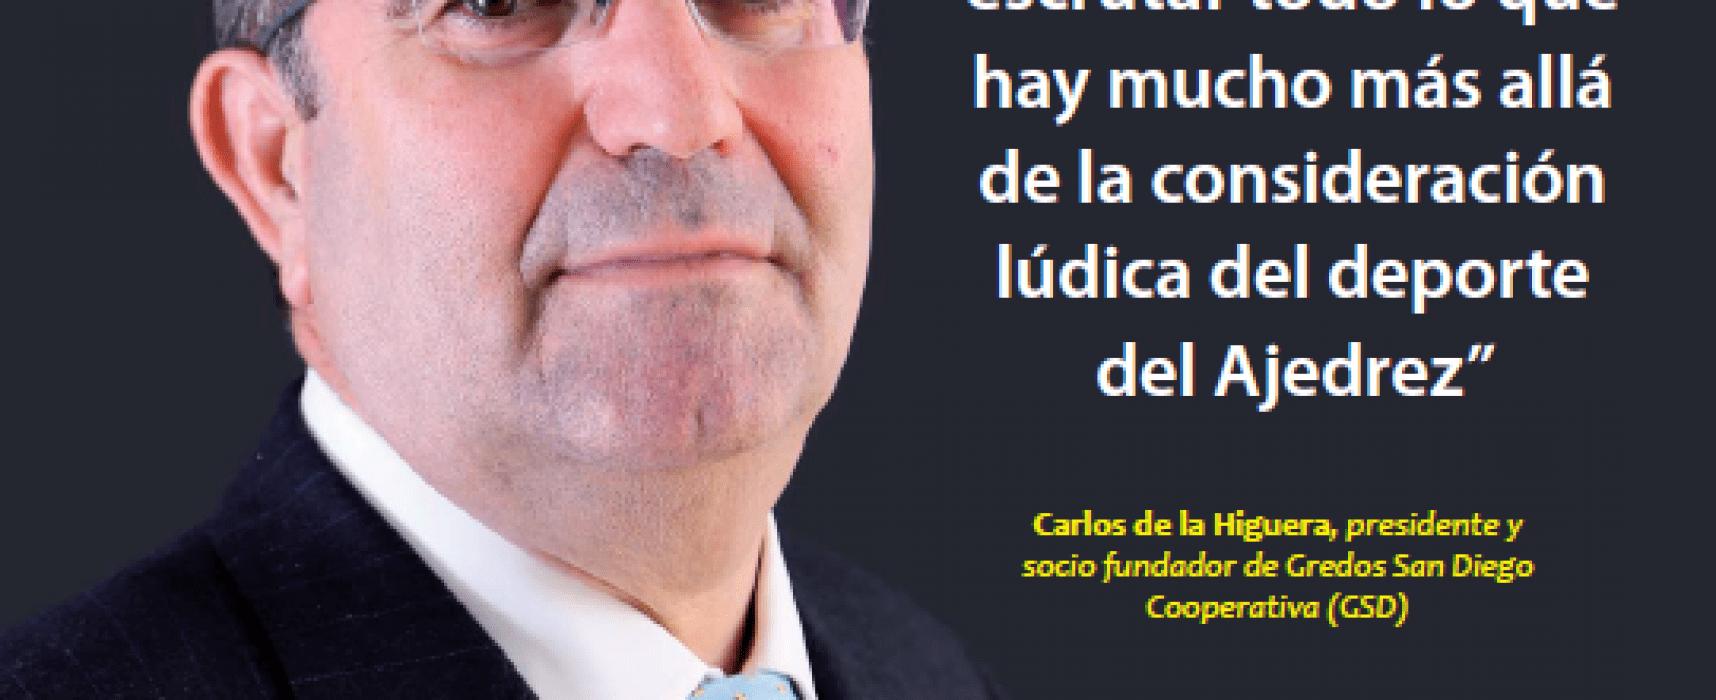 Disponible el nº 4 de la revista digital del Club Magic de Extremadura «Ajedrez social y terapéutico»